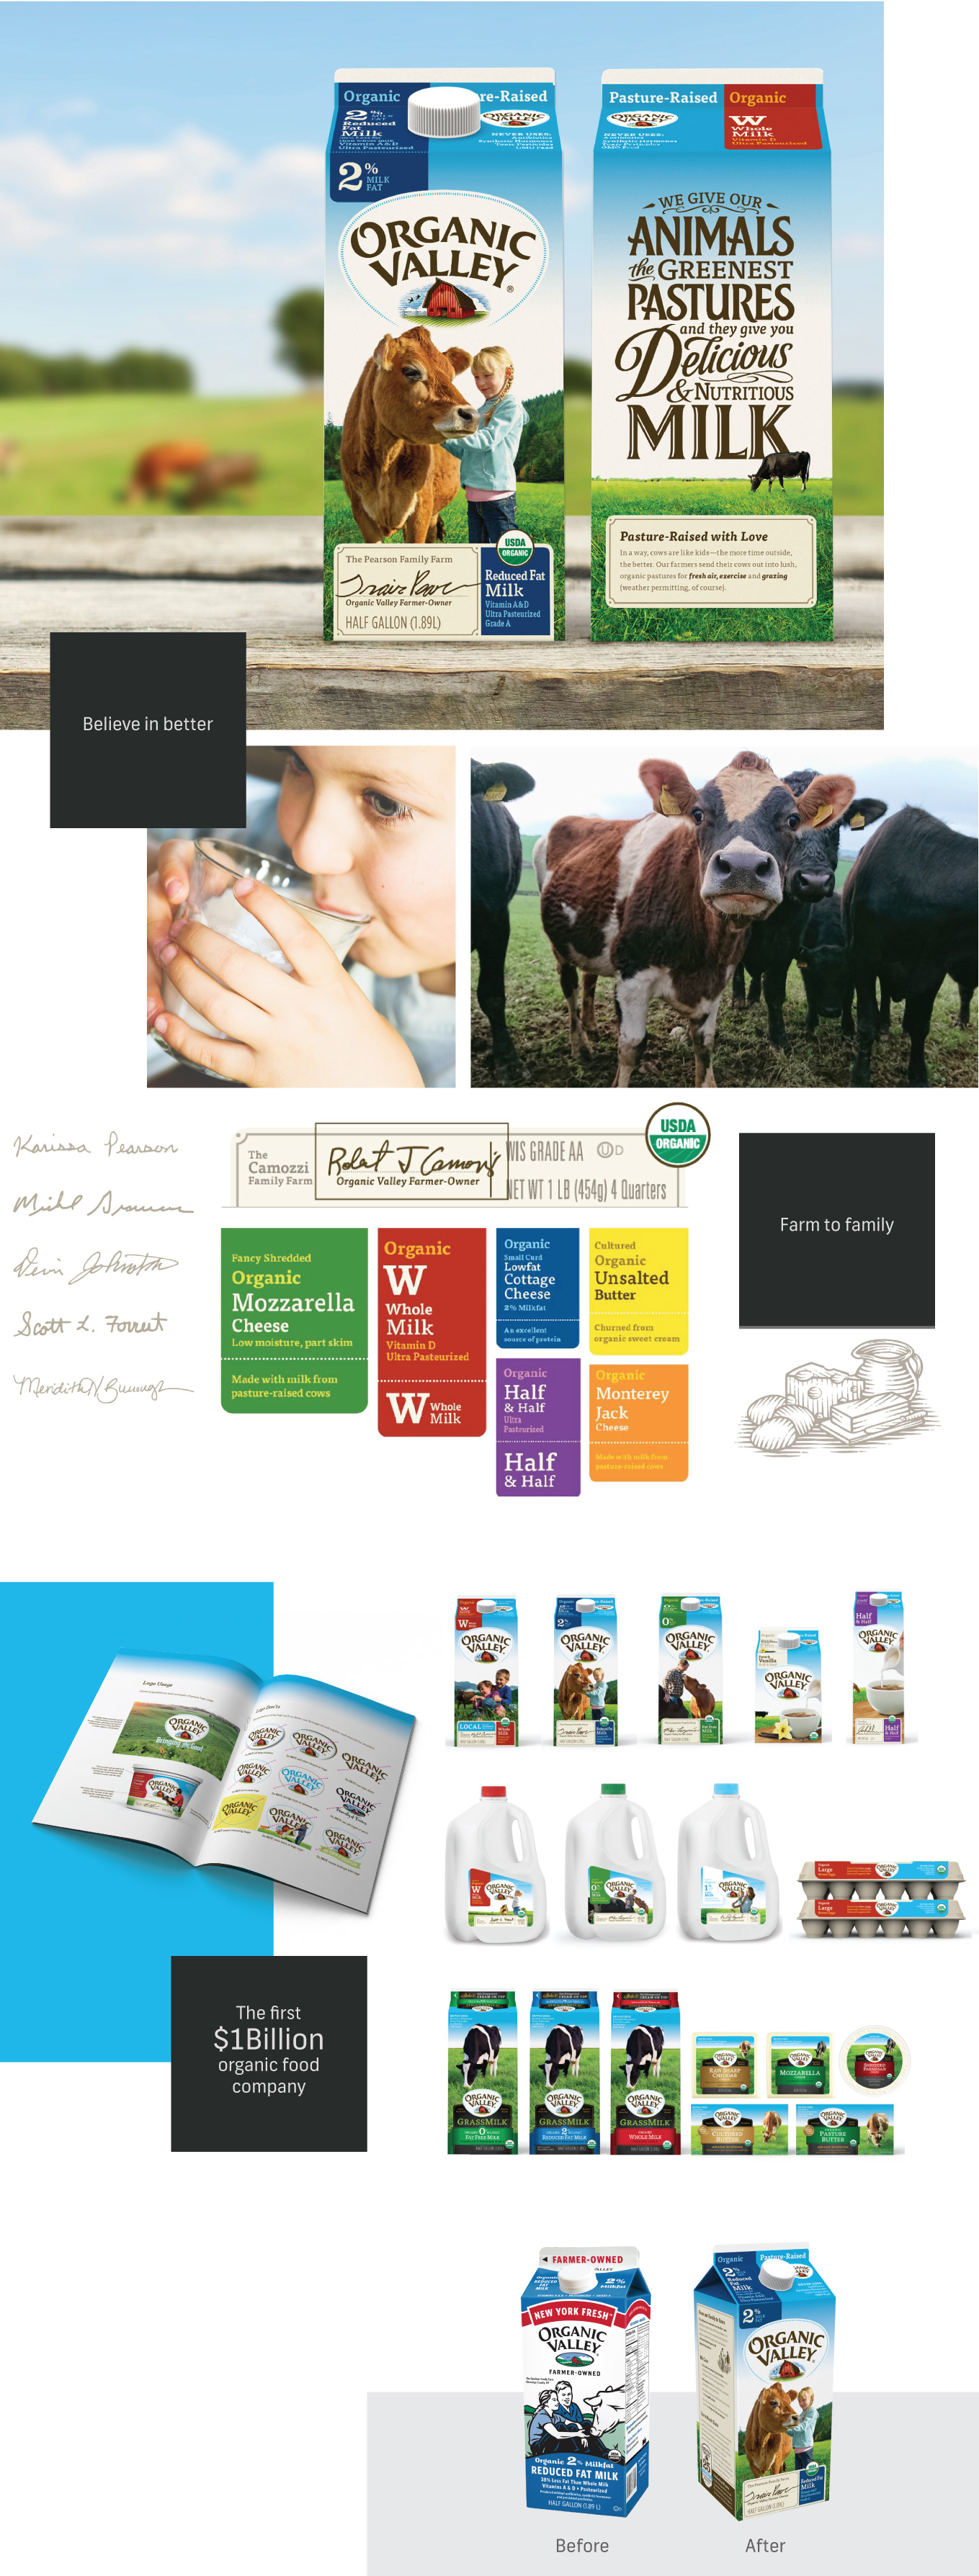 032819-Grid-Organic-Valley-NL.jpg